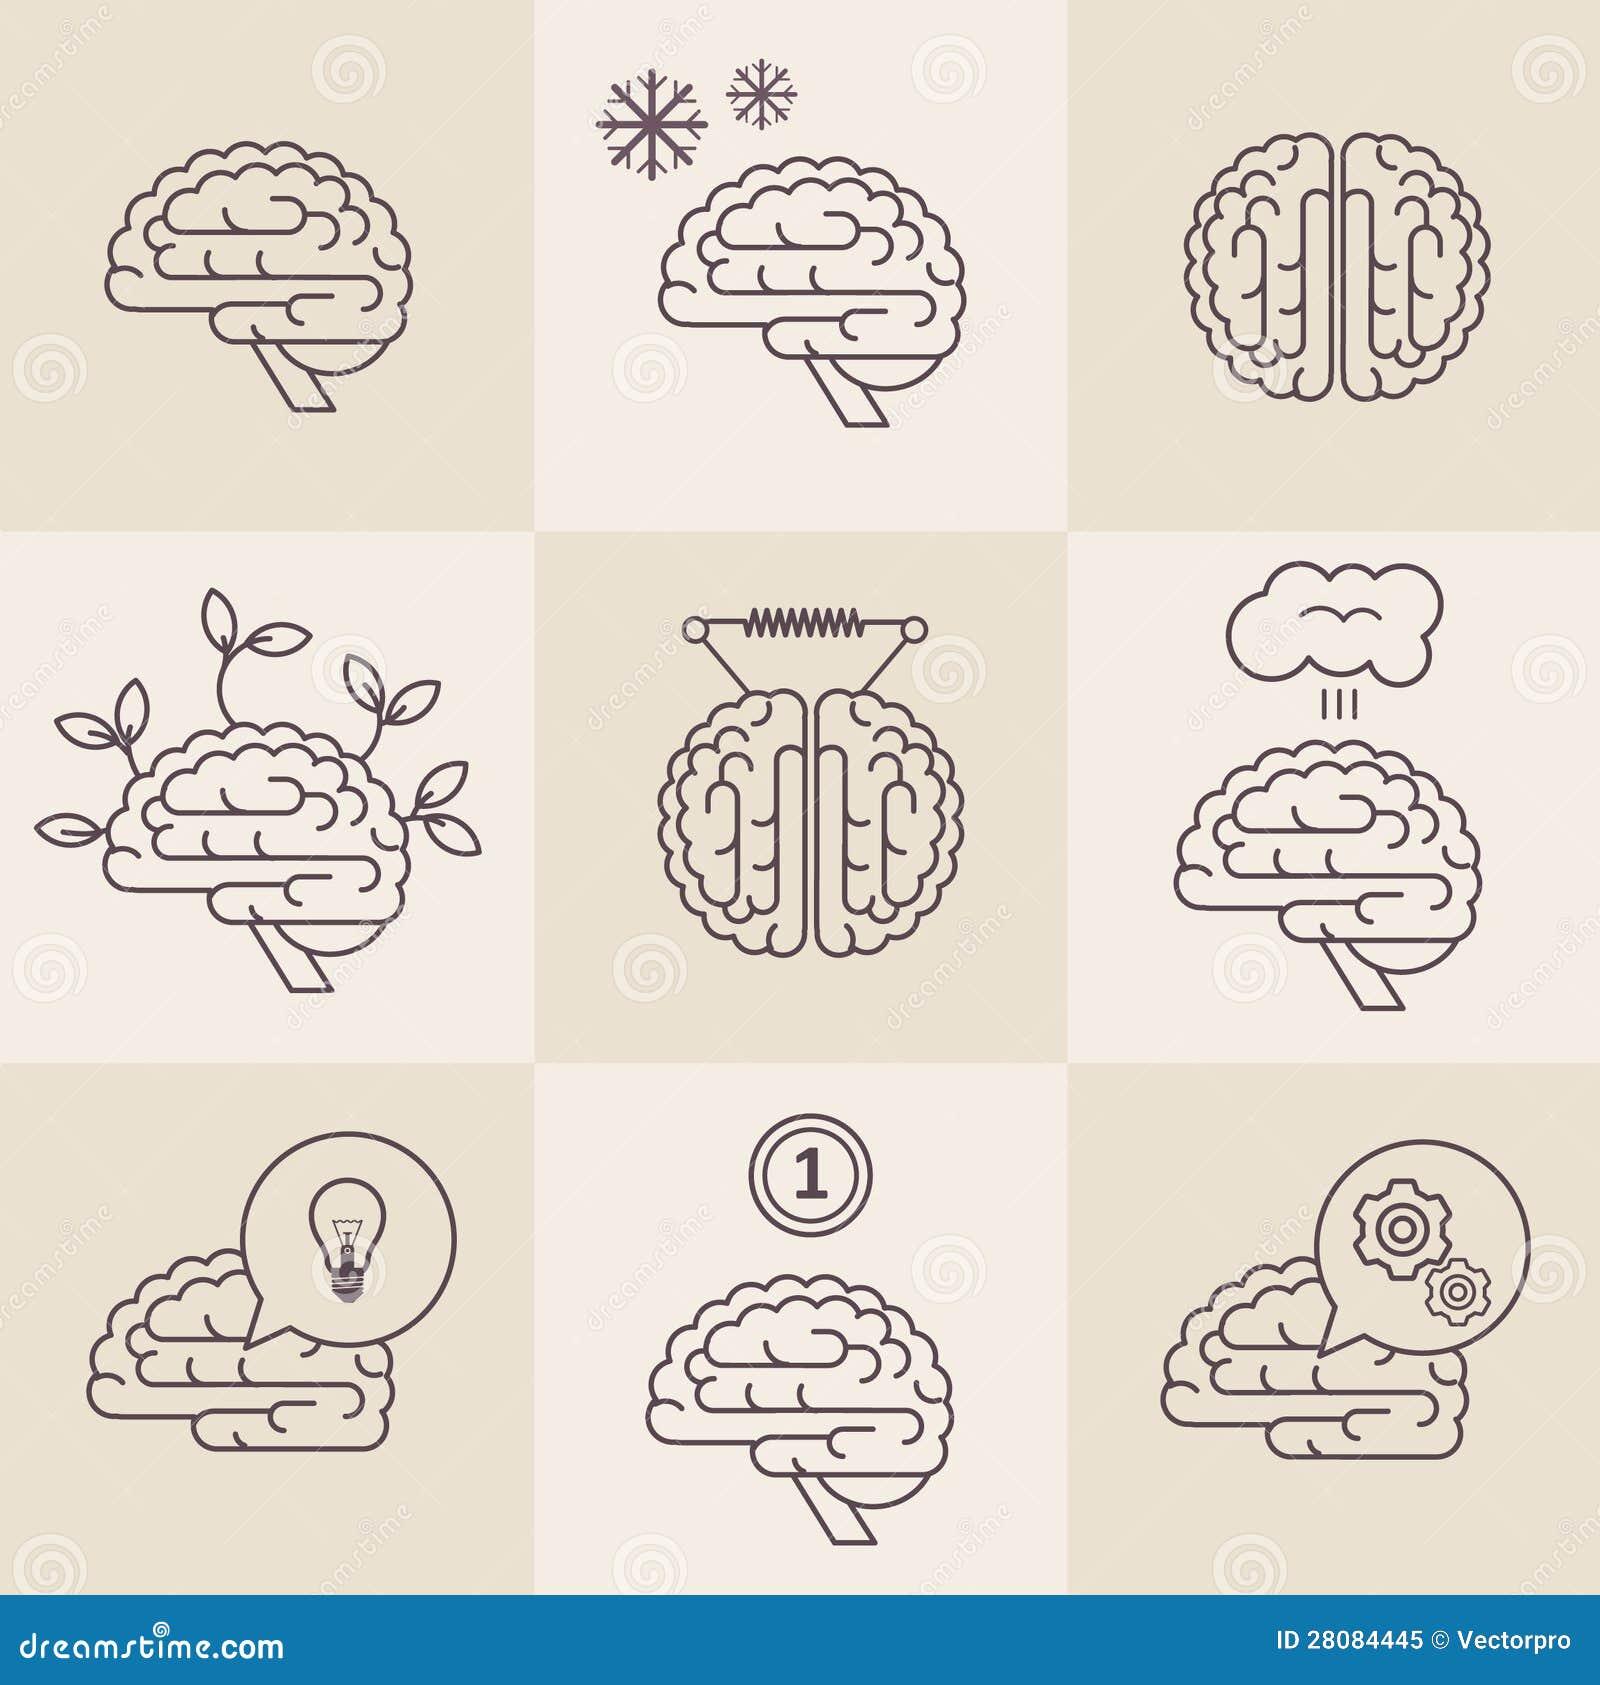 Ícones do cérebro